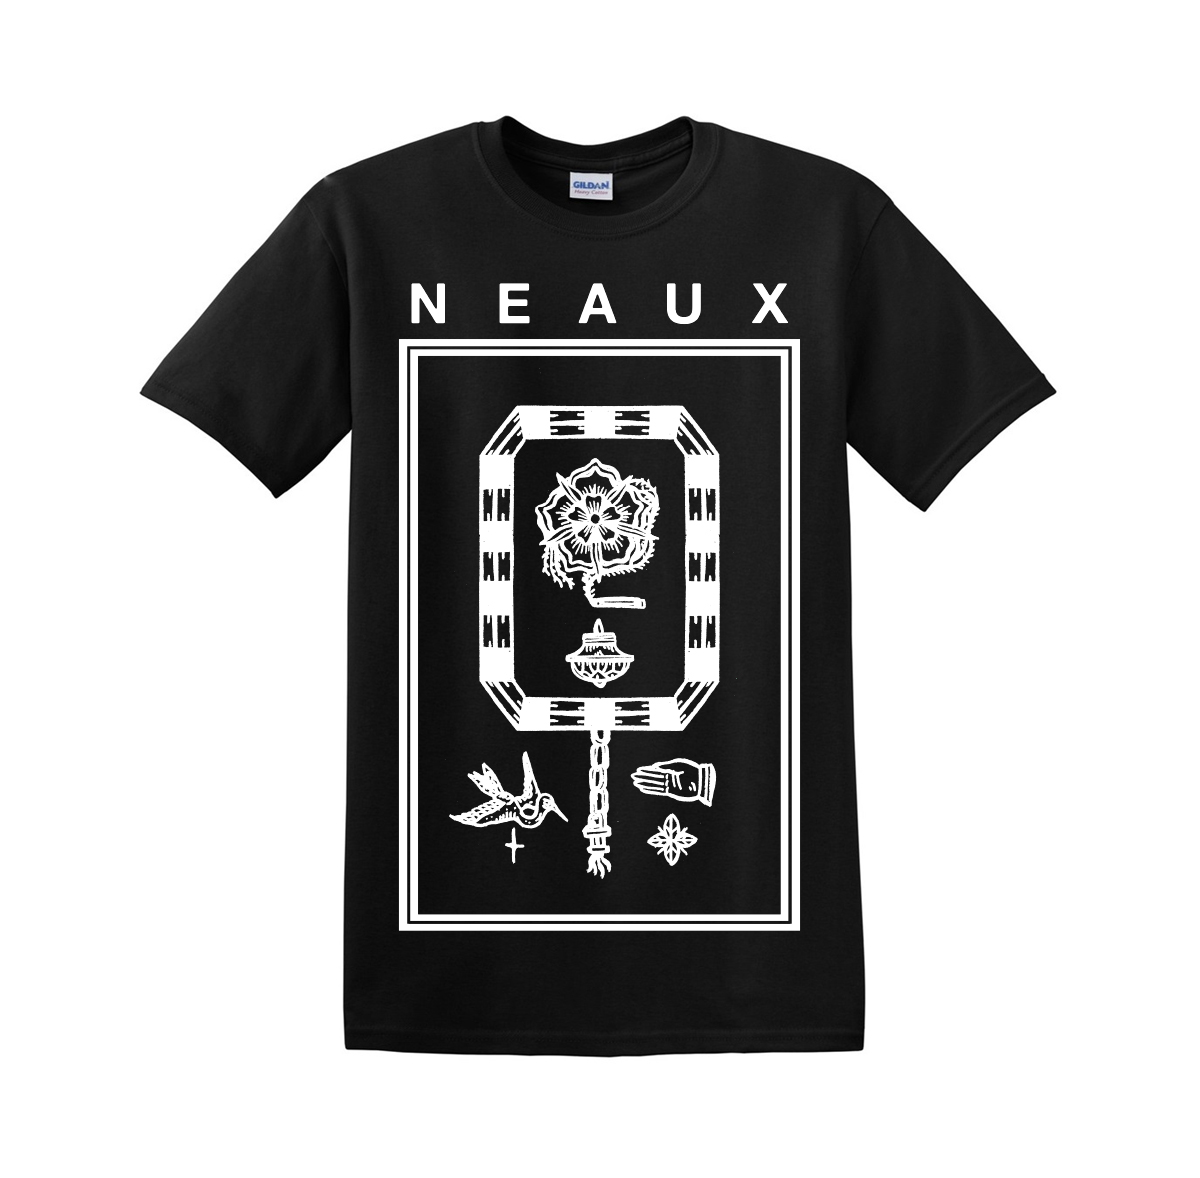 Neaux - Merchandise